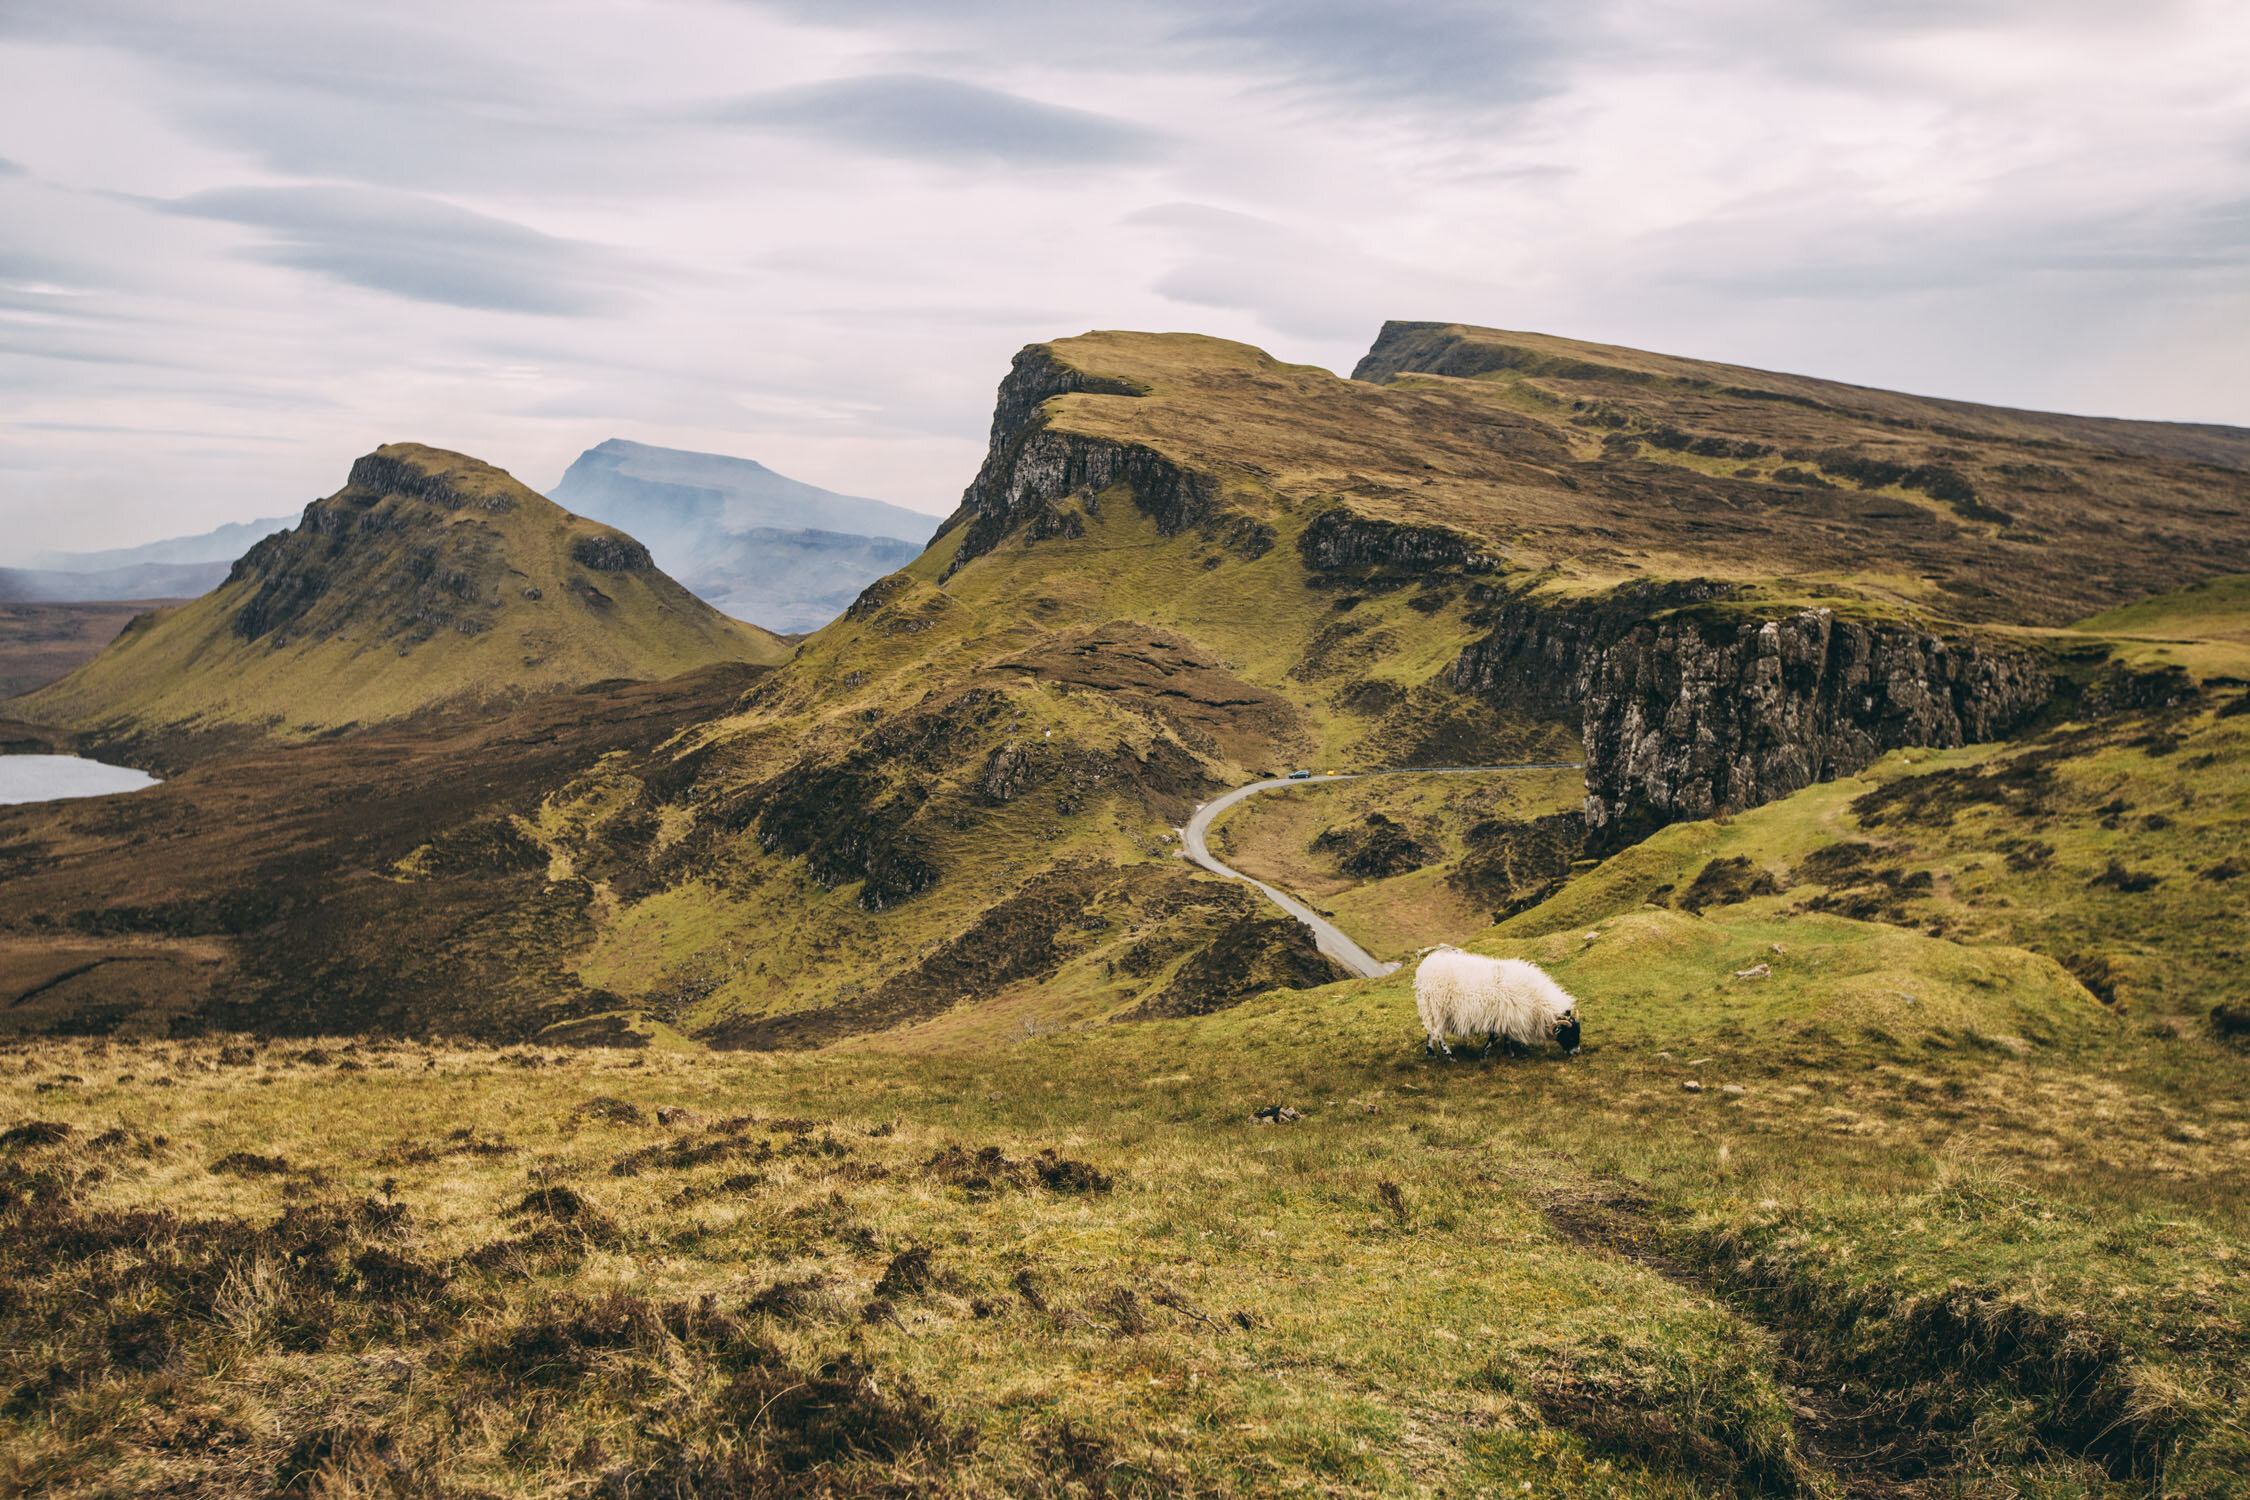 The Quiraing. Isle of Skye, Scotland. April 2019.